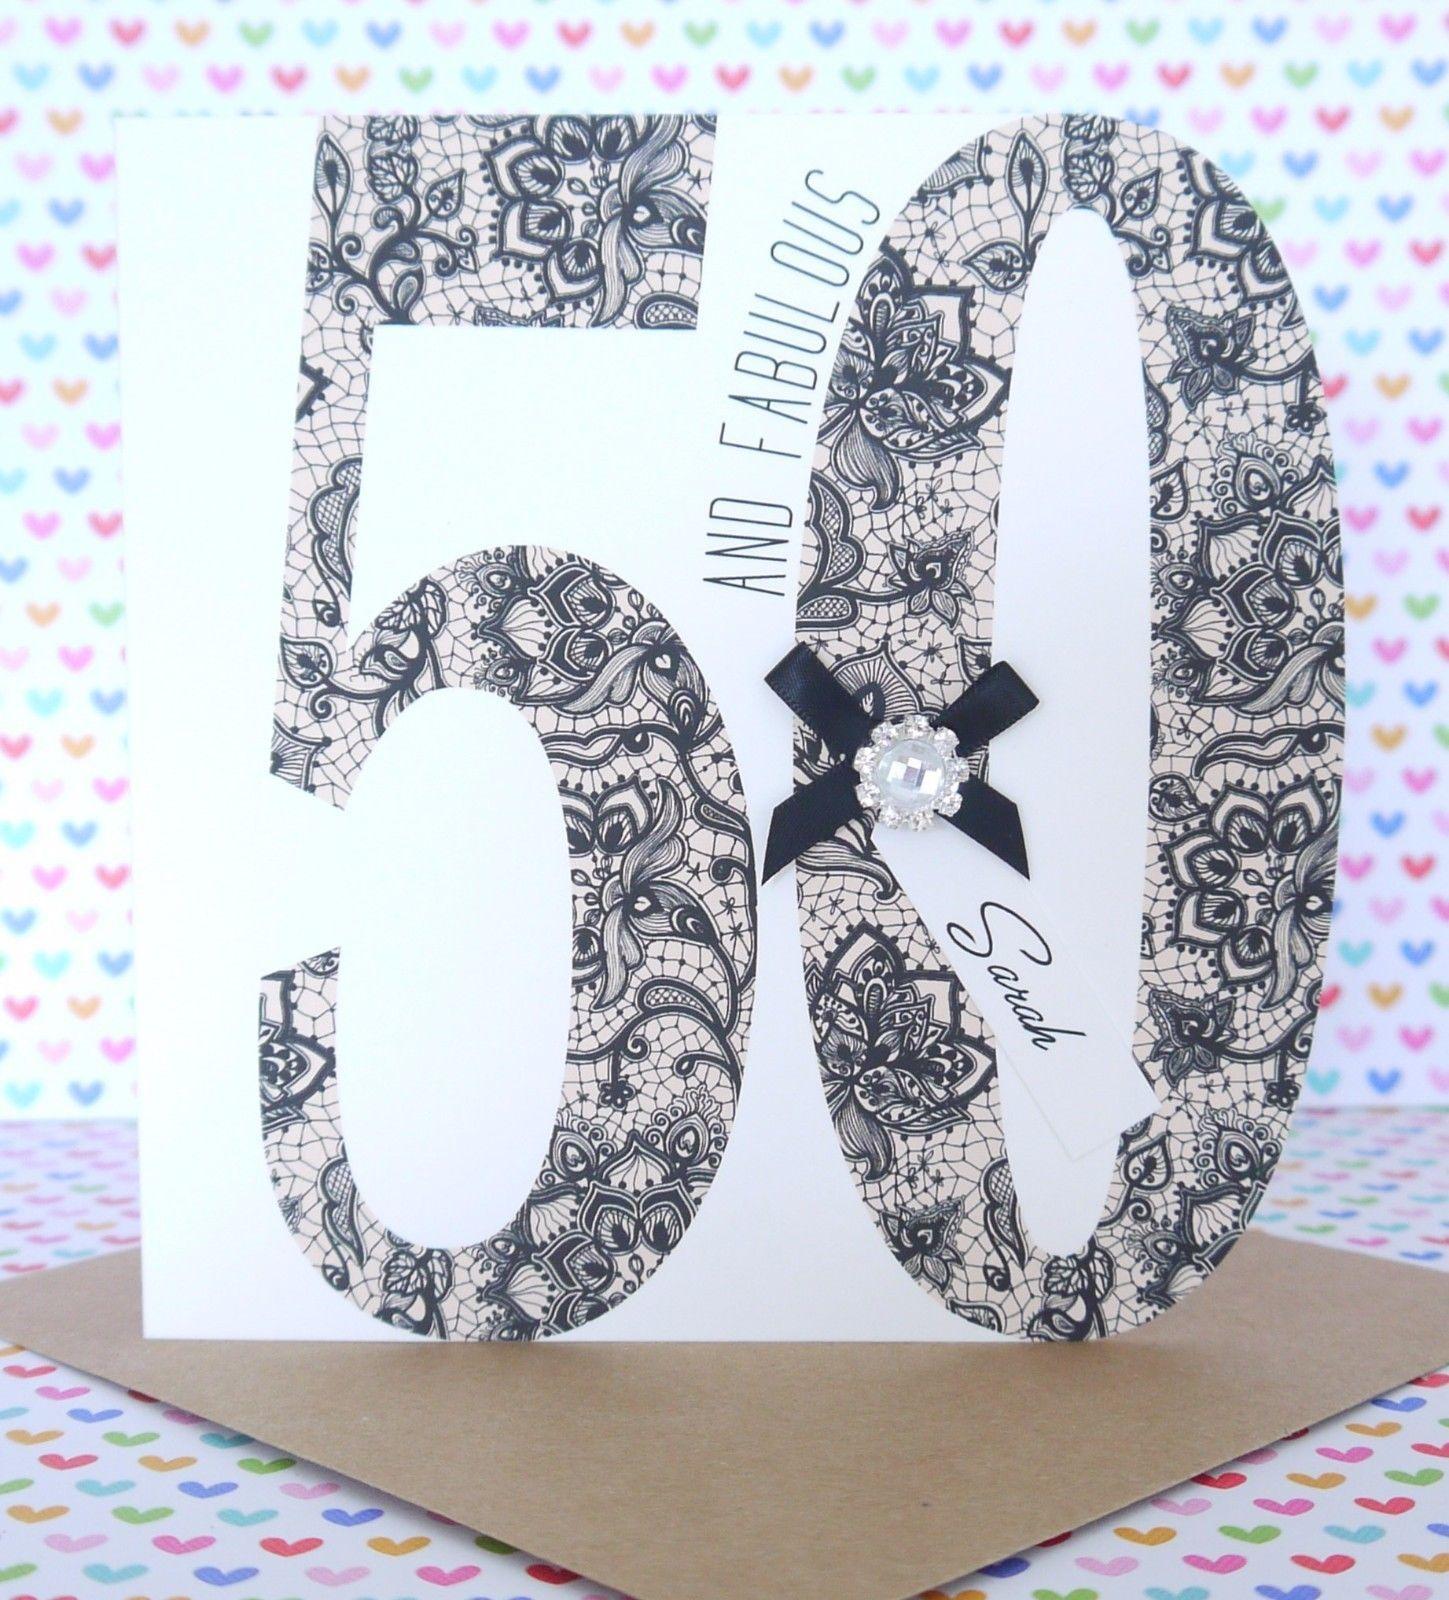 Personalised handmade 50th 60th birthday card sister mum personalised handmade 50th 60th birthday card sister mum bookmarktalkfo Choice Image